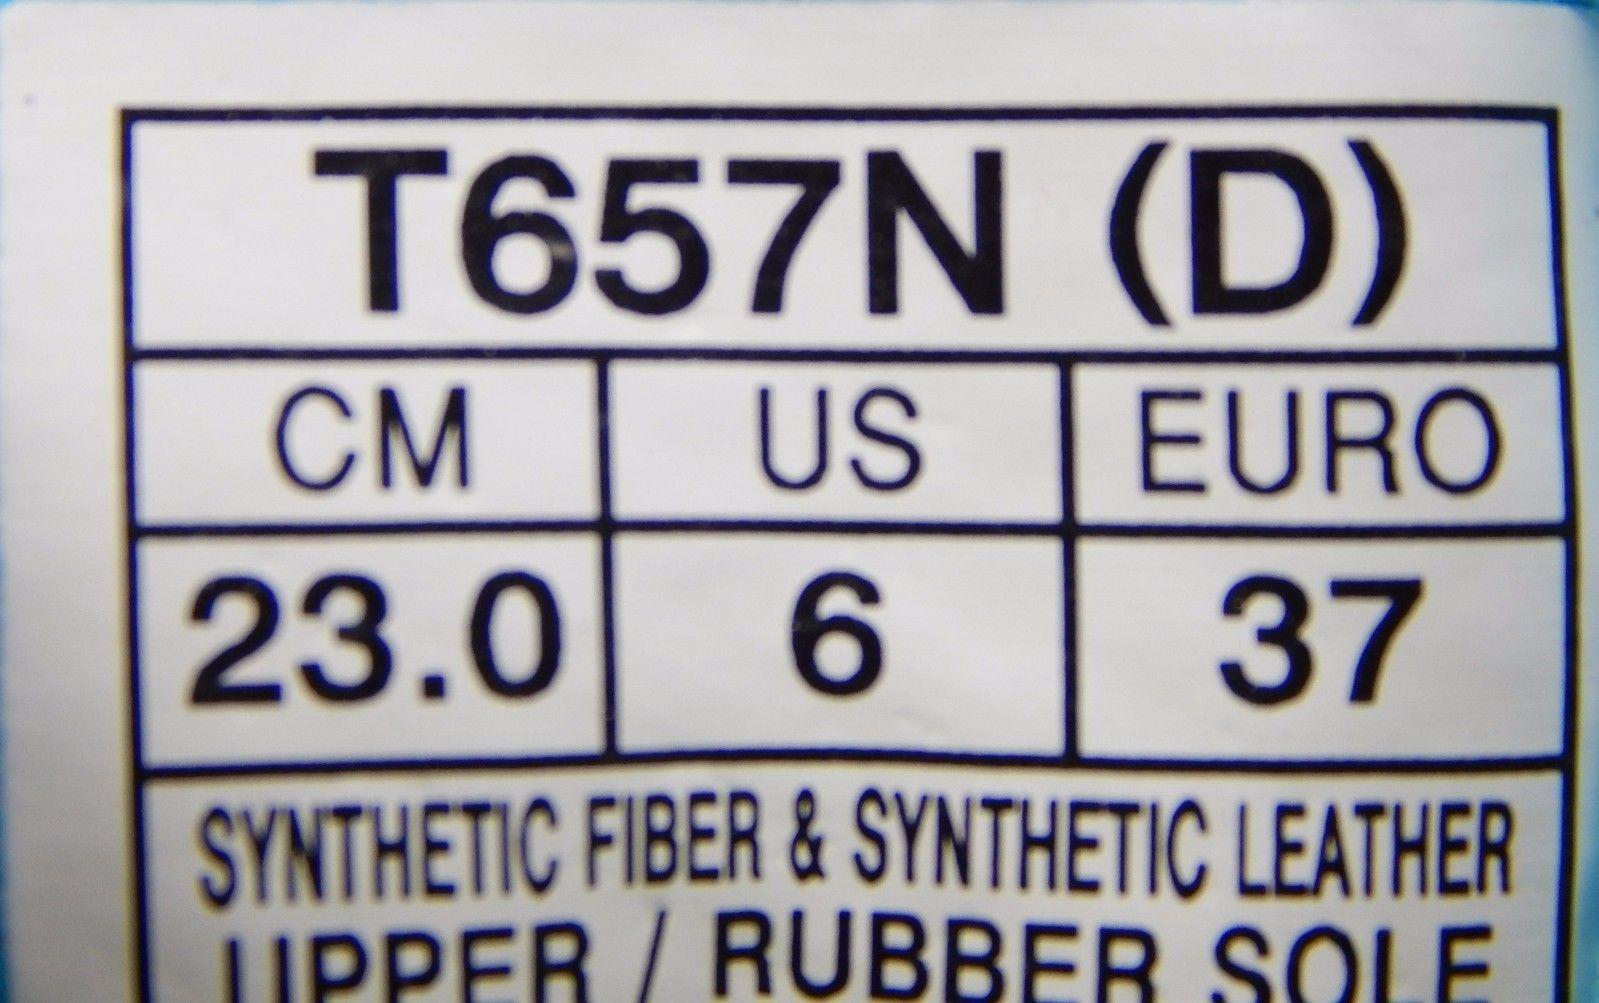 Asics GT 2000 v 4 Women's Running Shoes Size US 6 D WIDE EU 37 Silver Blue T657N